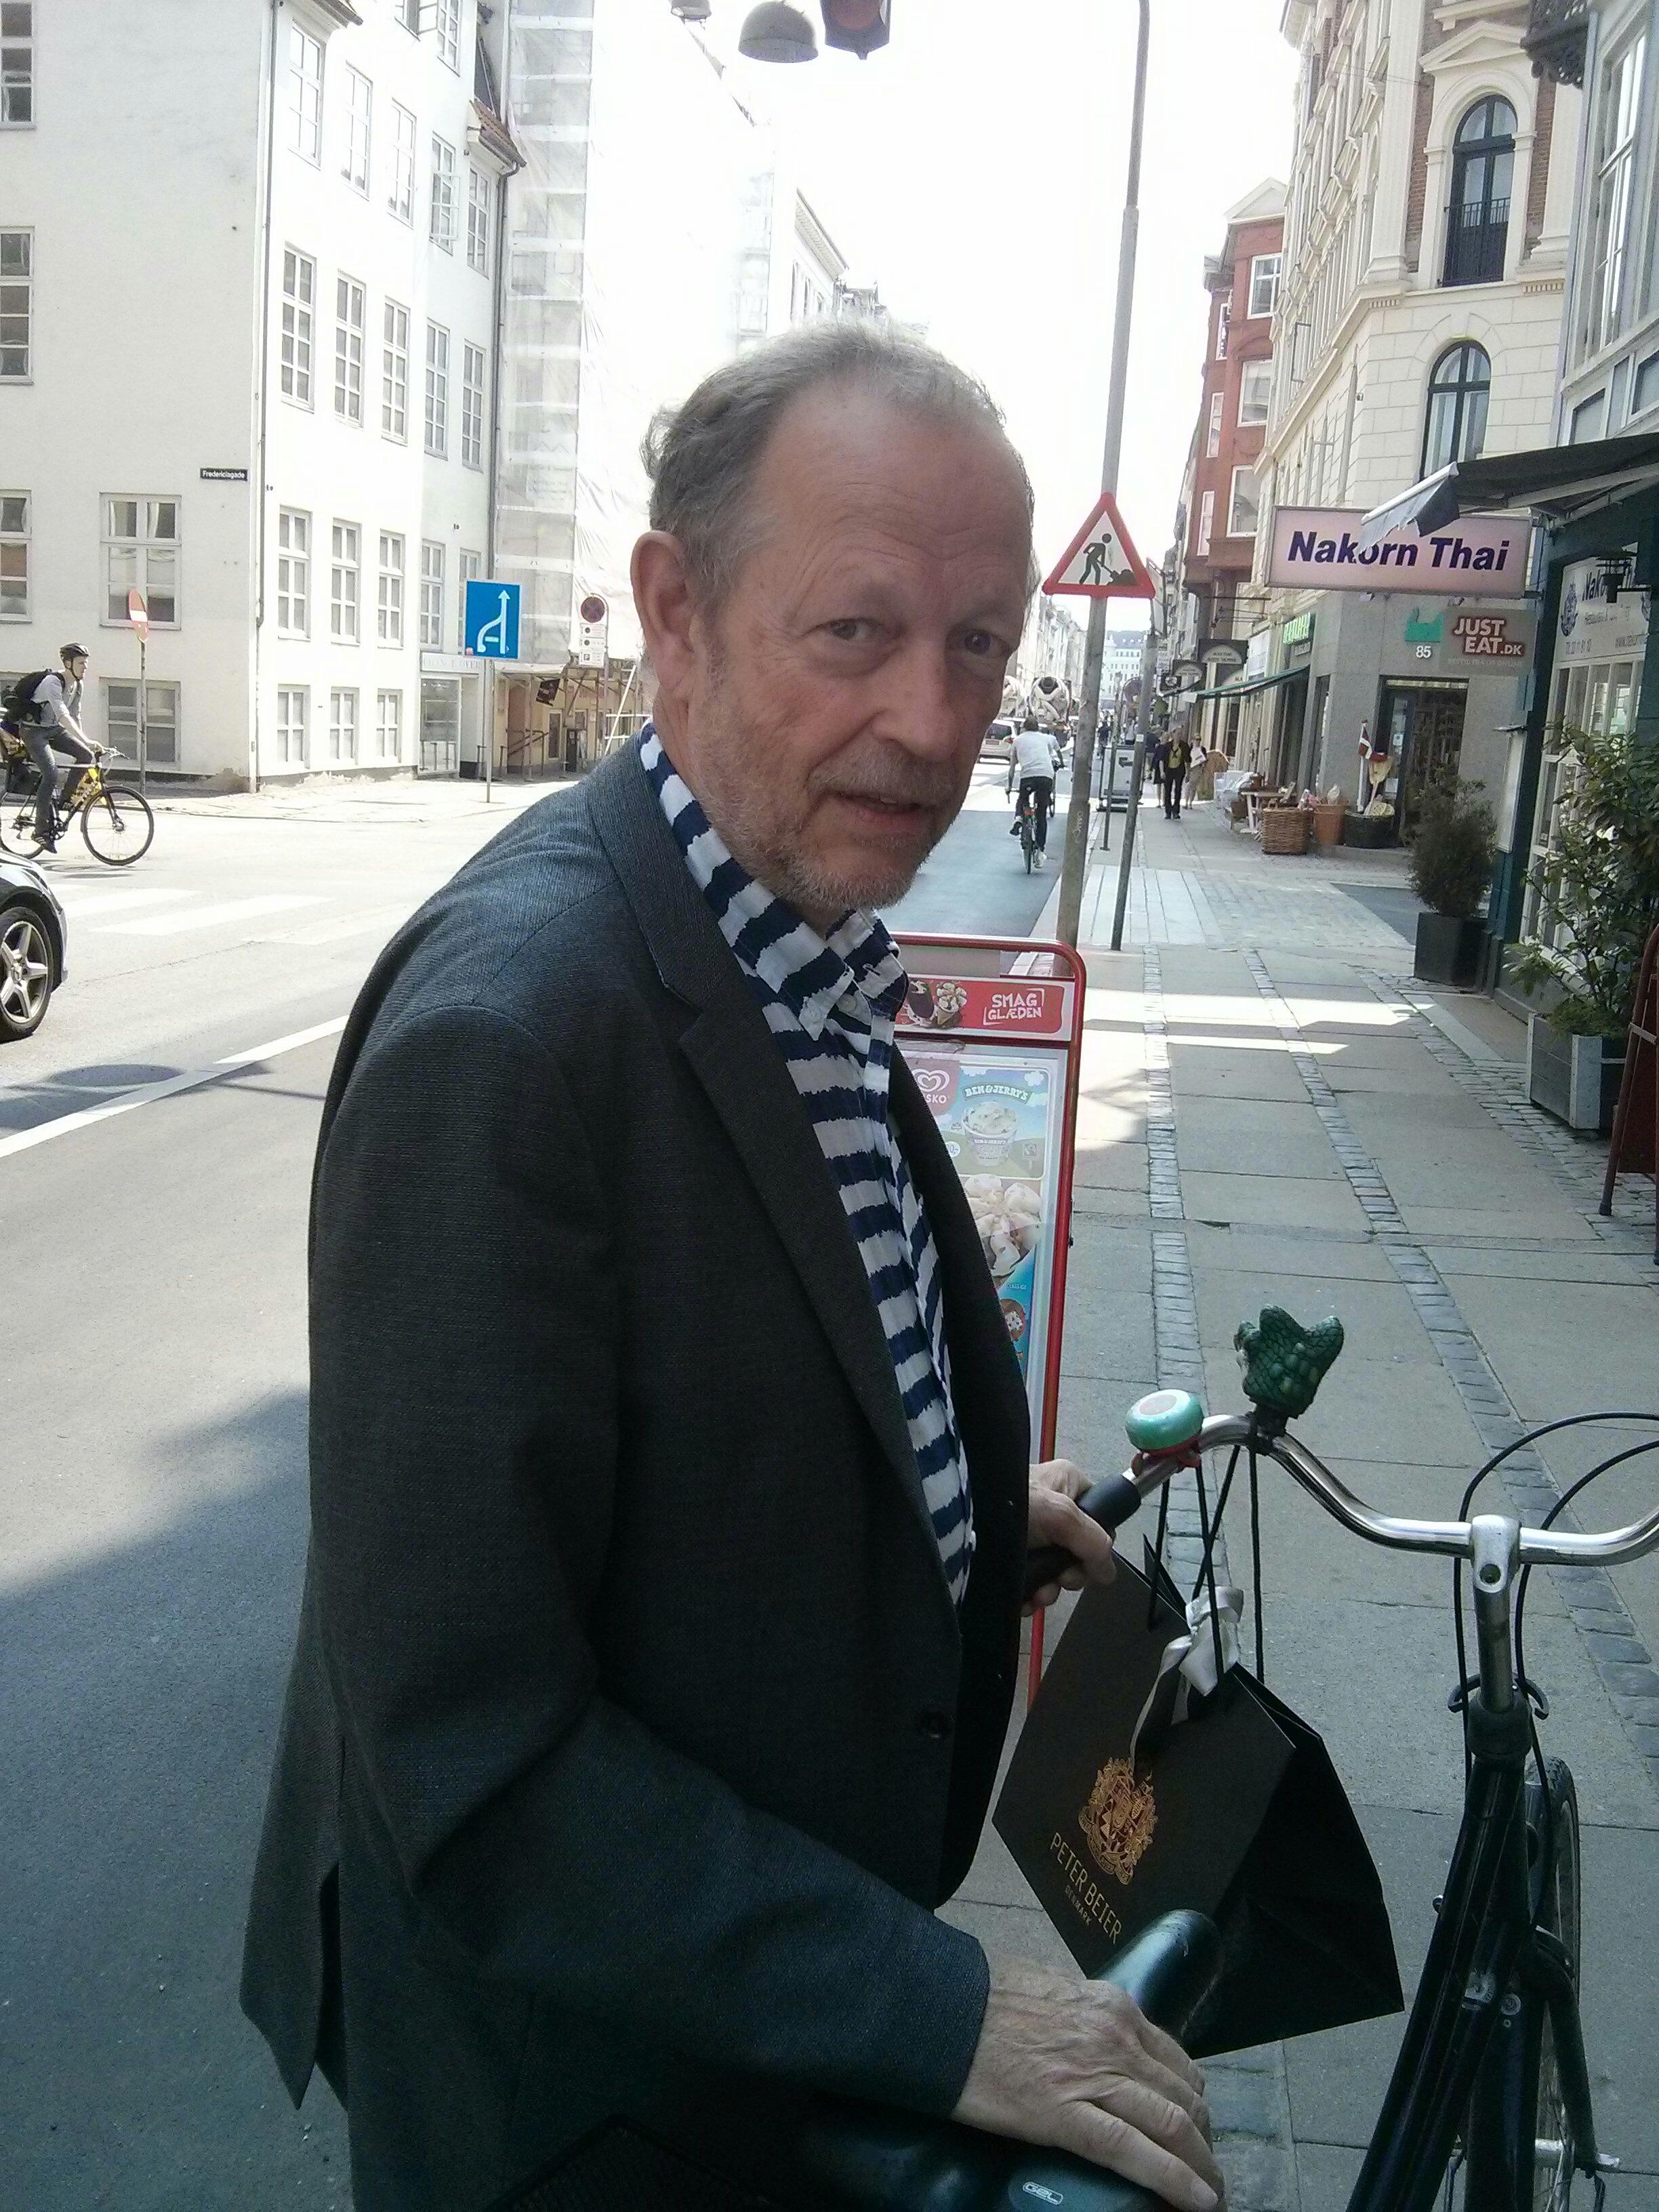 michael von essen, leaving lunch on bike as a true dane of to day.